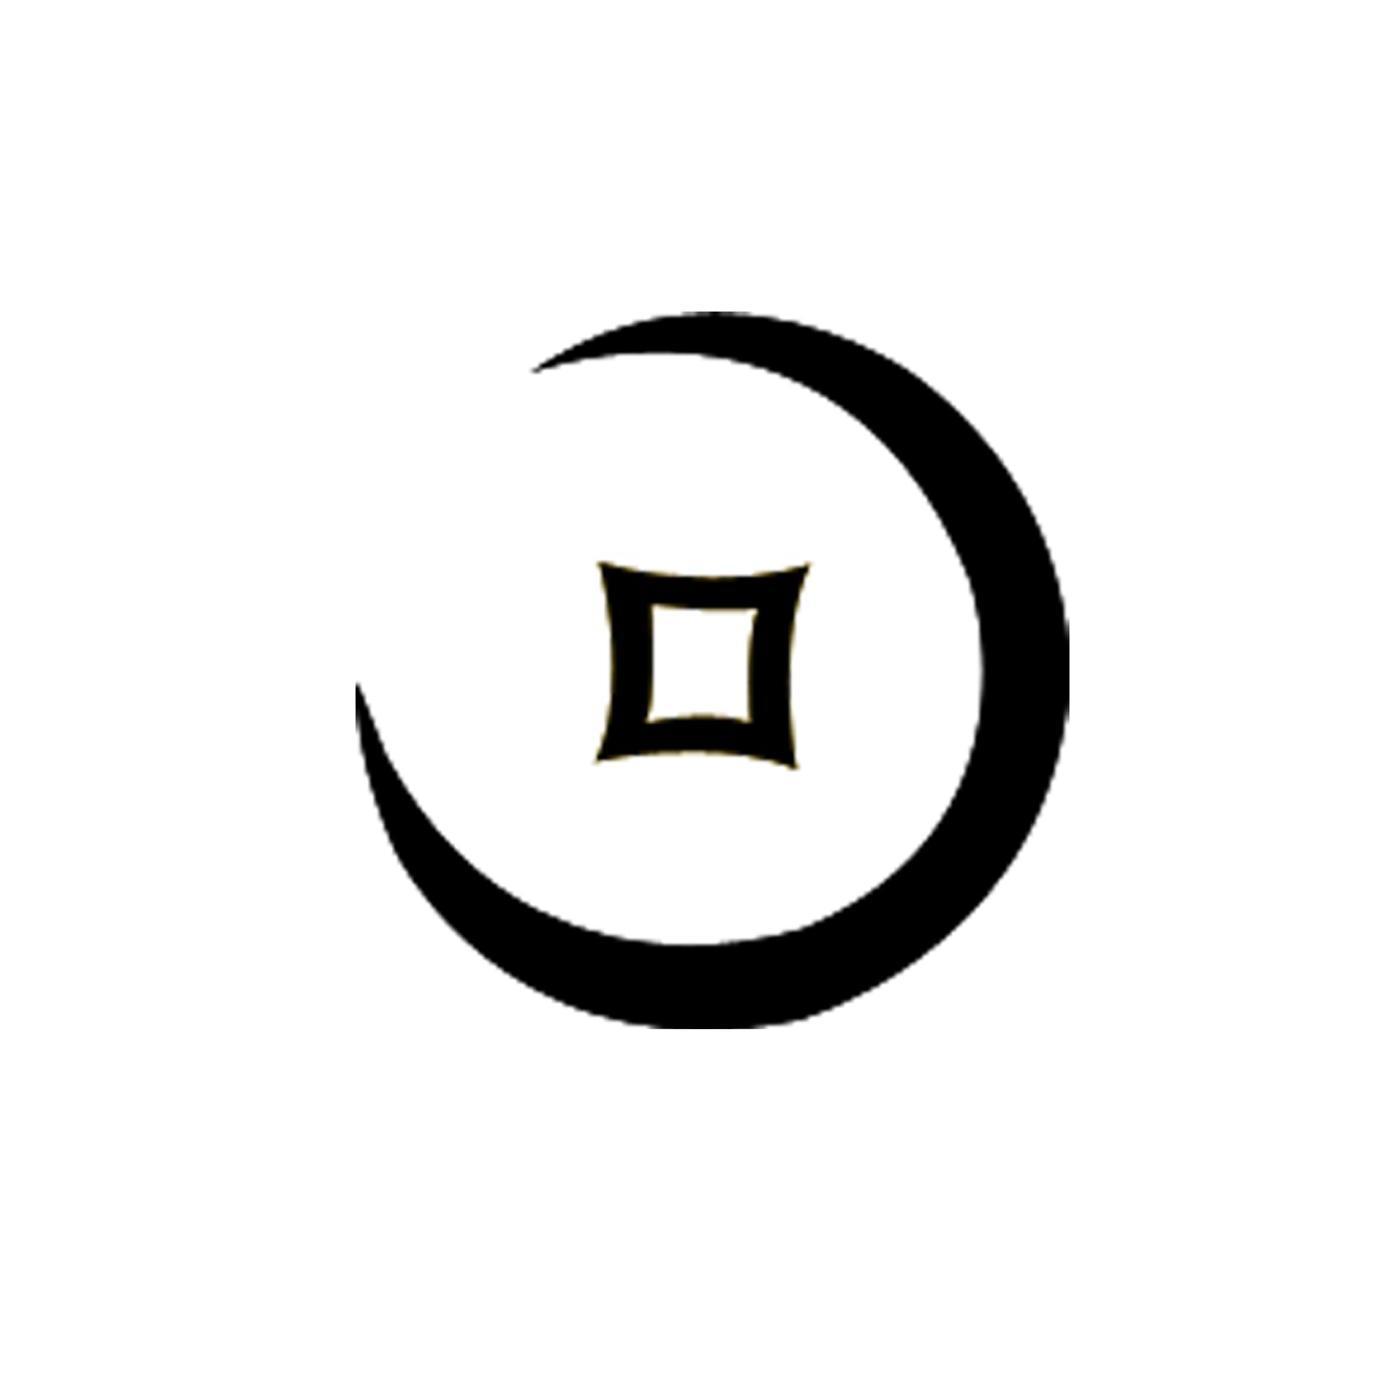 logo logo 标识 标志 设计 矢量 矢量图 素材 图标 1400_1400